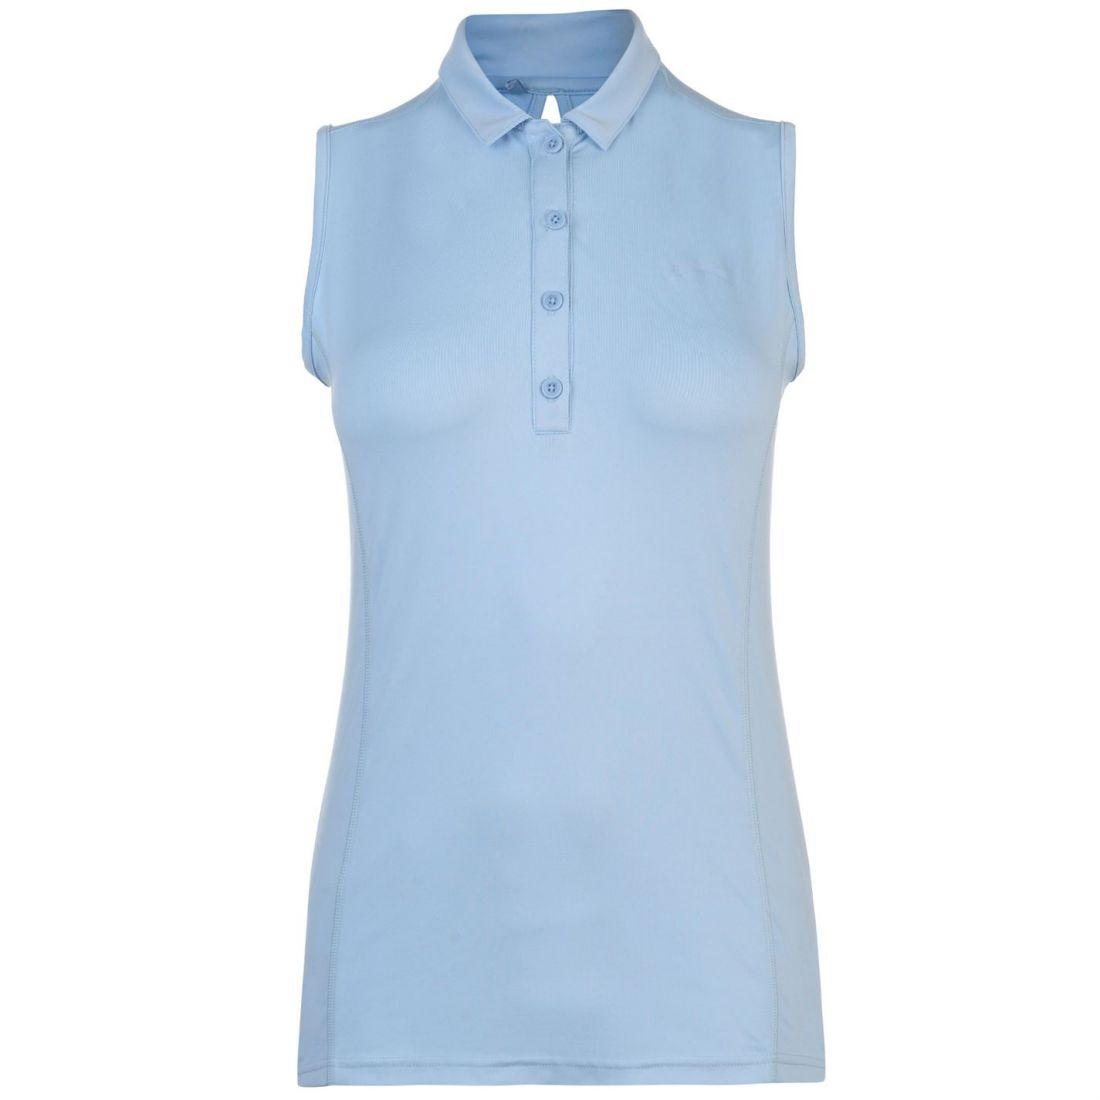 3d10c45400b8e Image is loading Slazenger-Womens-Sleeveless-Polo-Shirt-Performance-Tee-Top